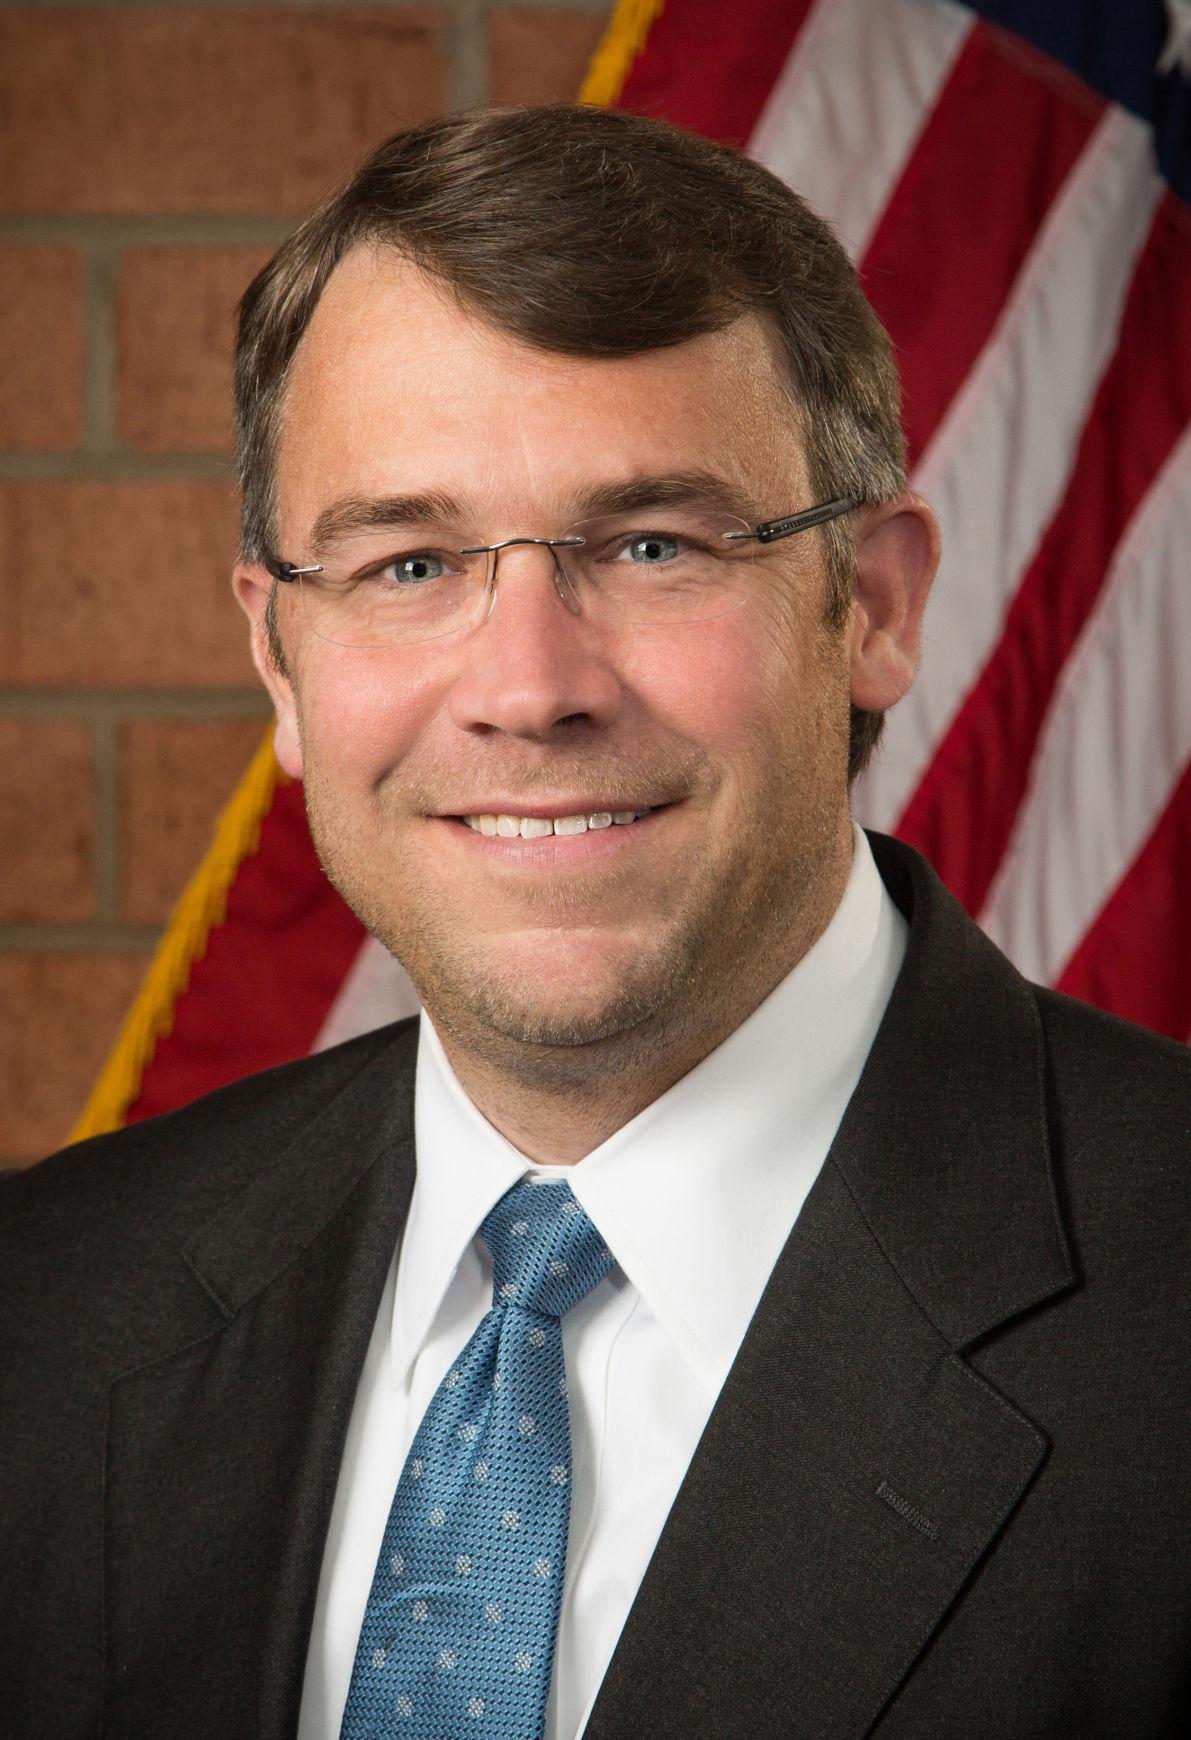 David Smitherman